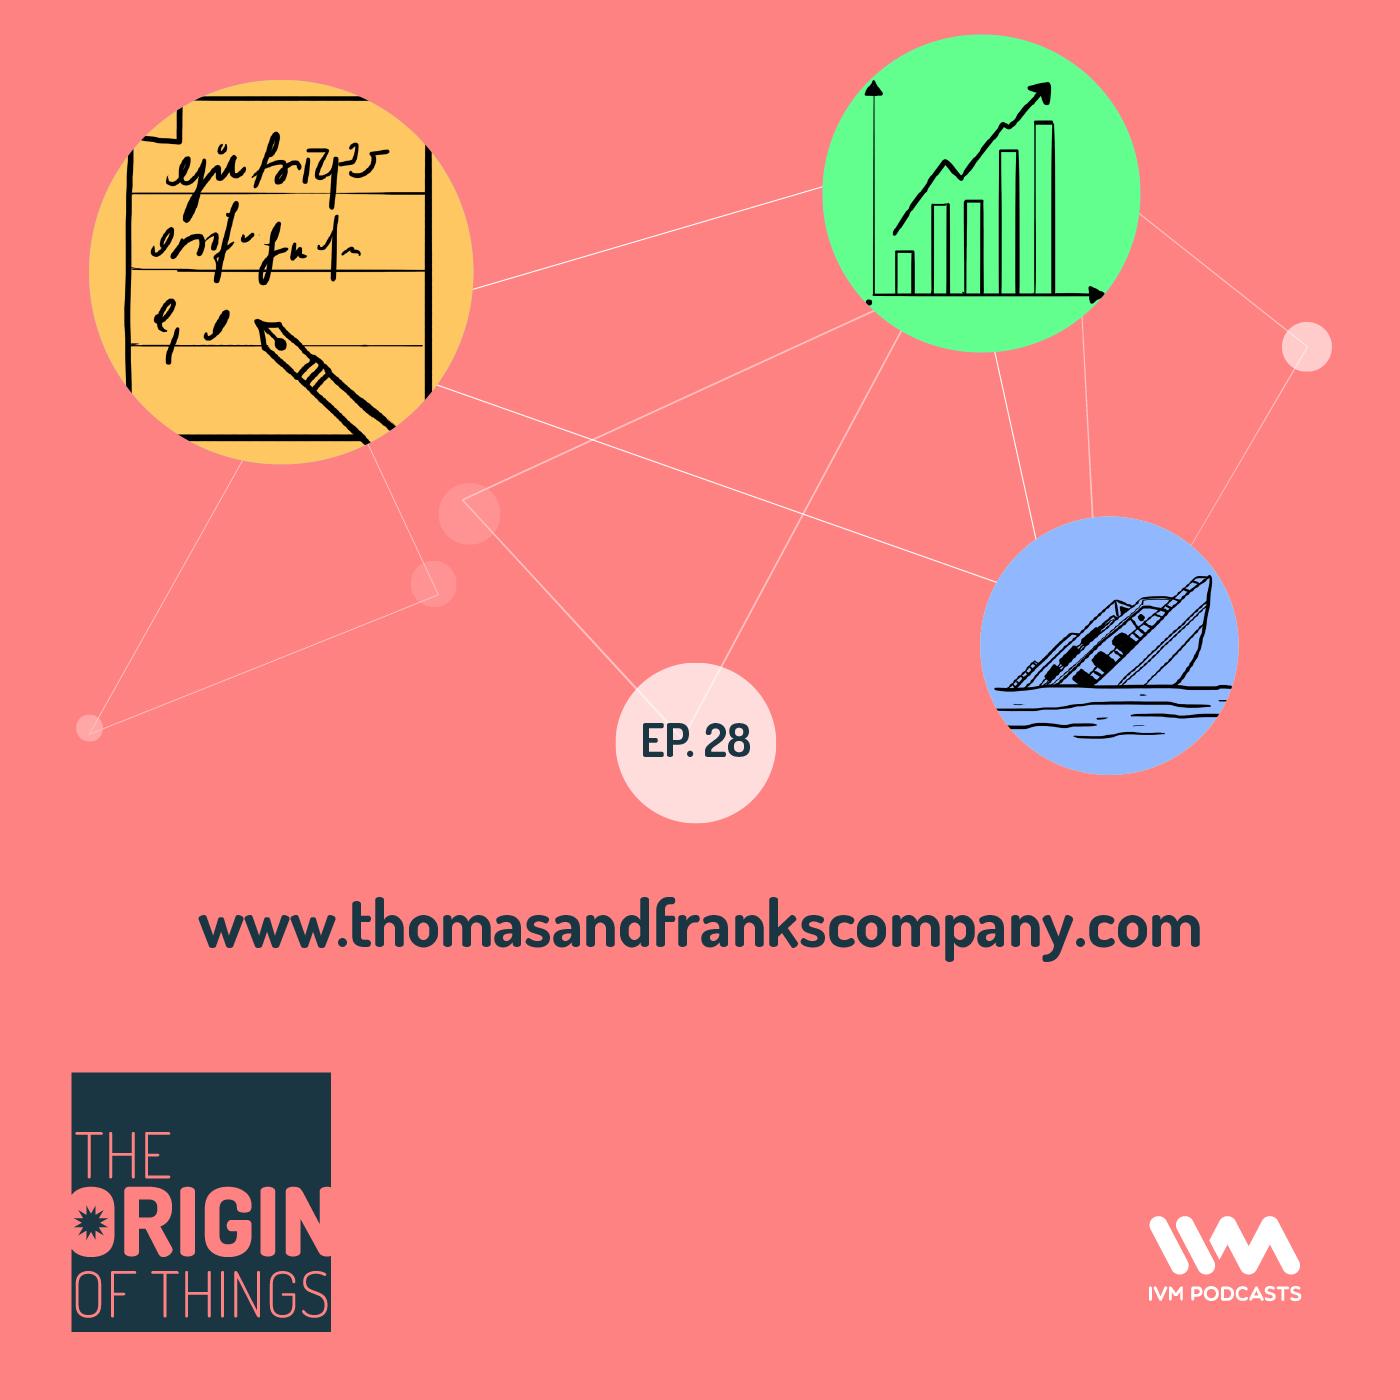 Ep. 28: www.thomasandfrankscompany.com